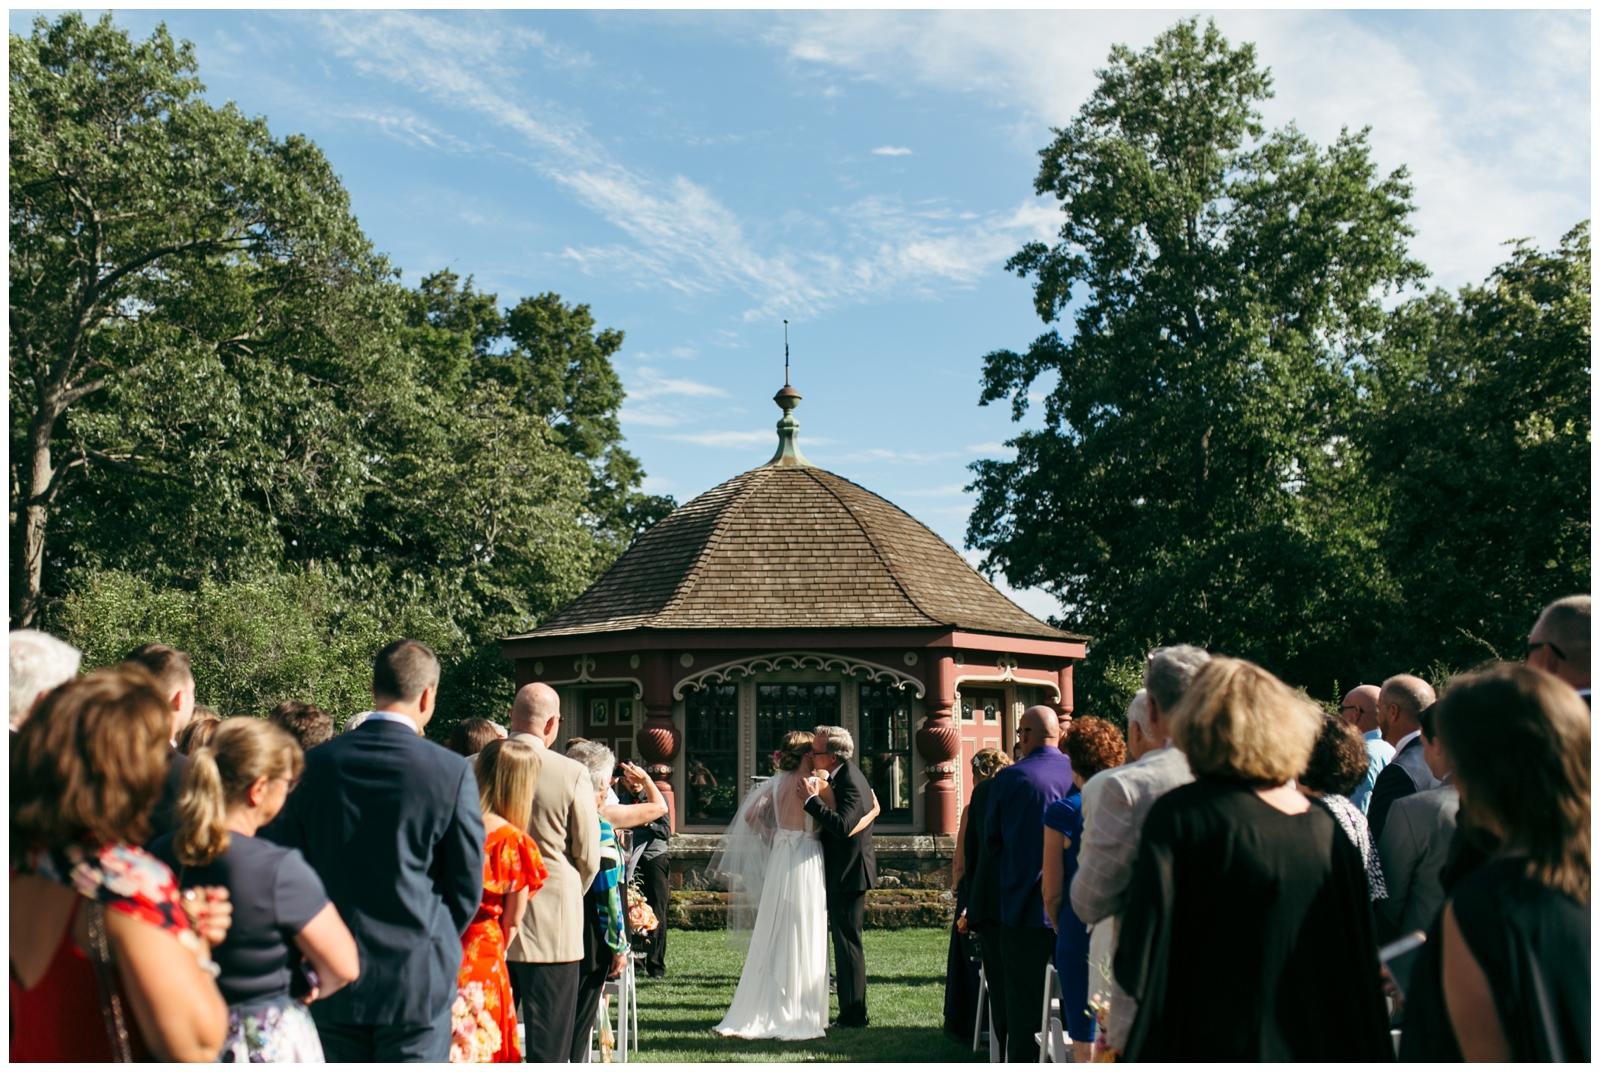 Moraine-Farm-wedding-Bailey-Q-Photo-Massachusetts-wedding-photpgrapher-060.jpg